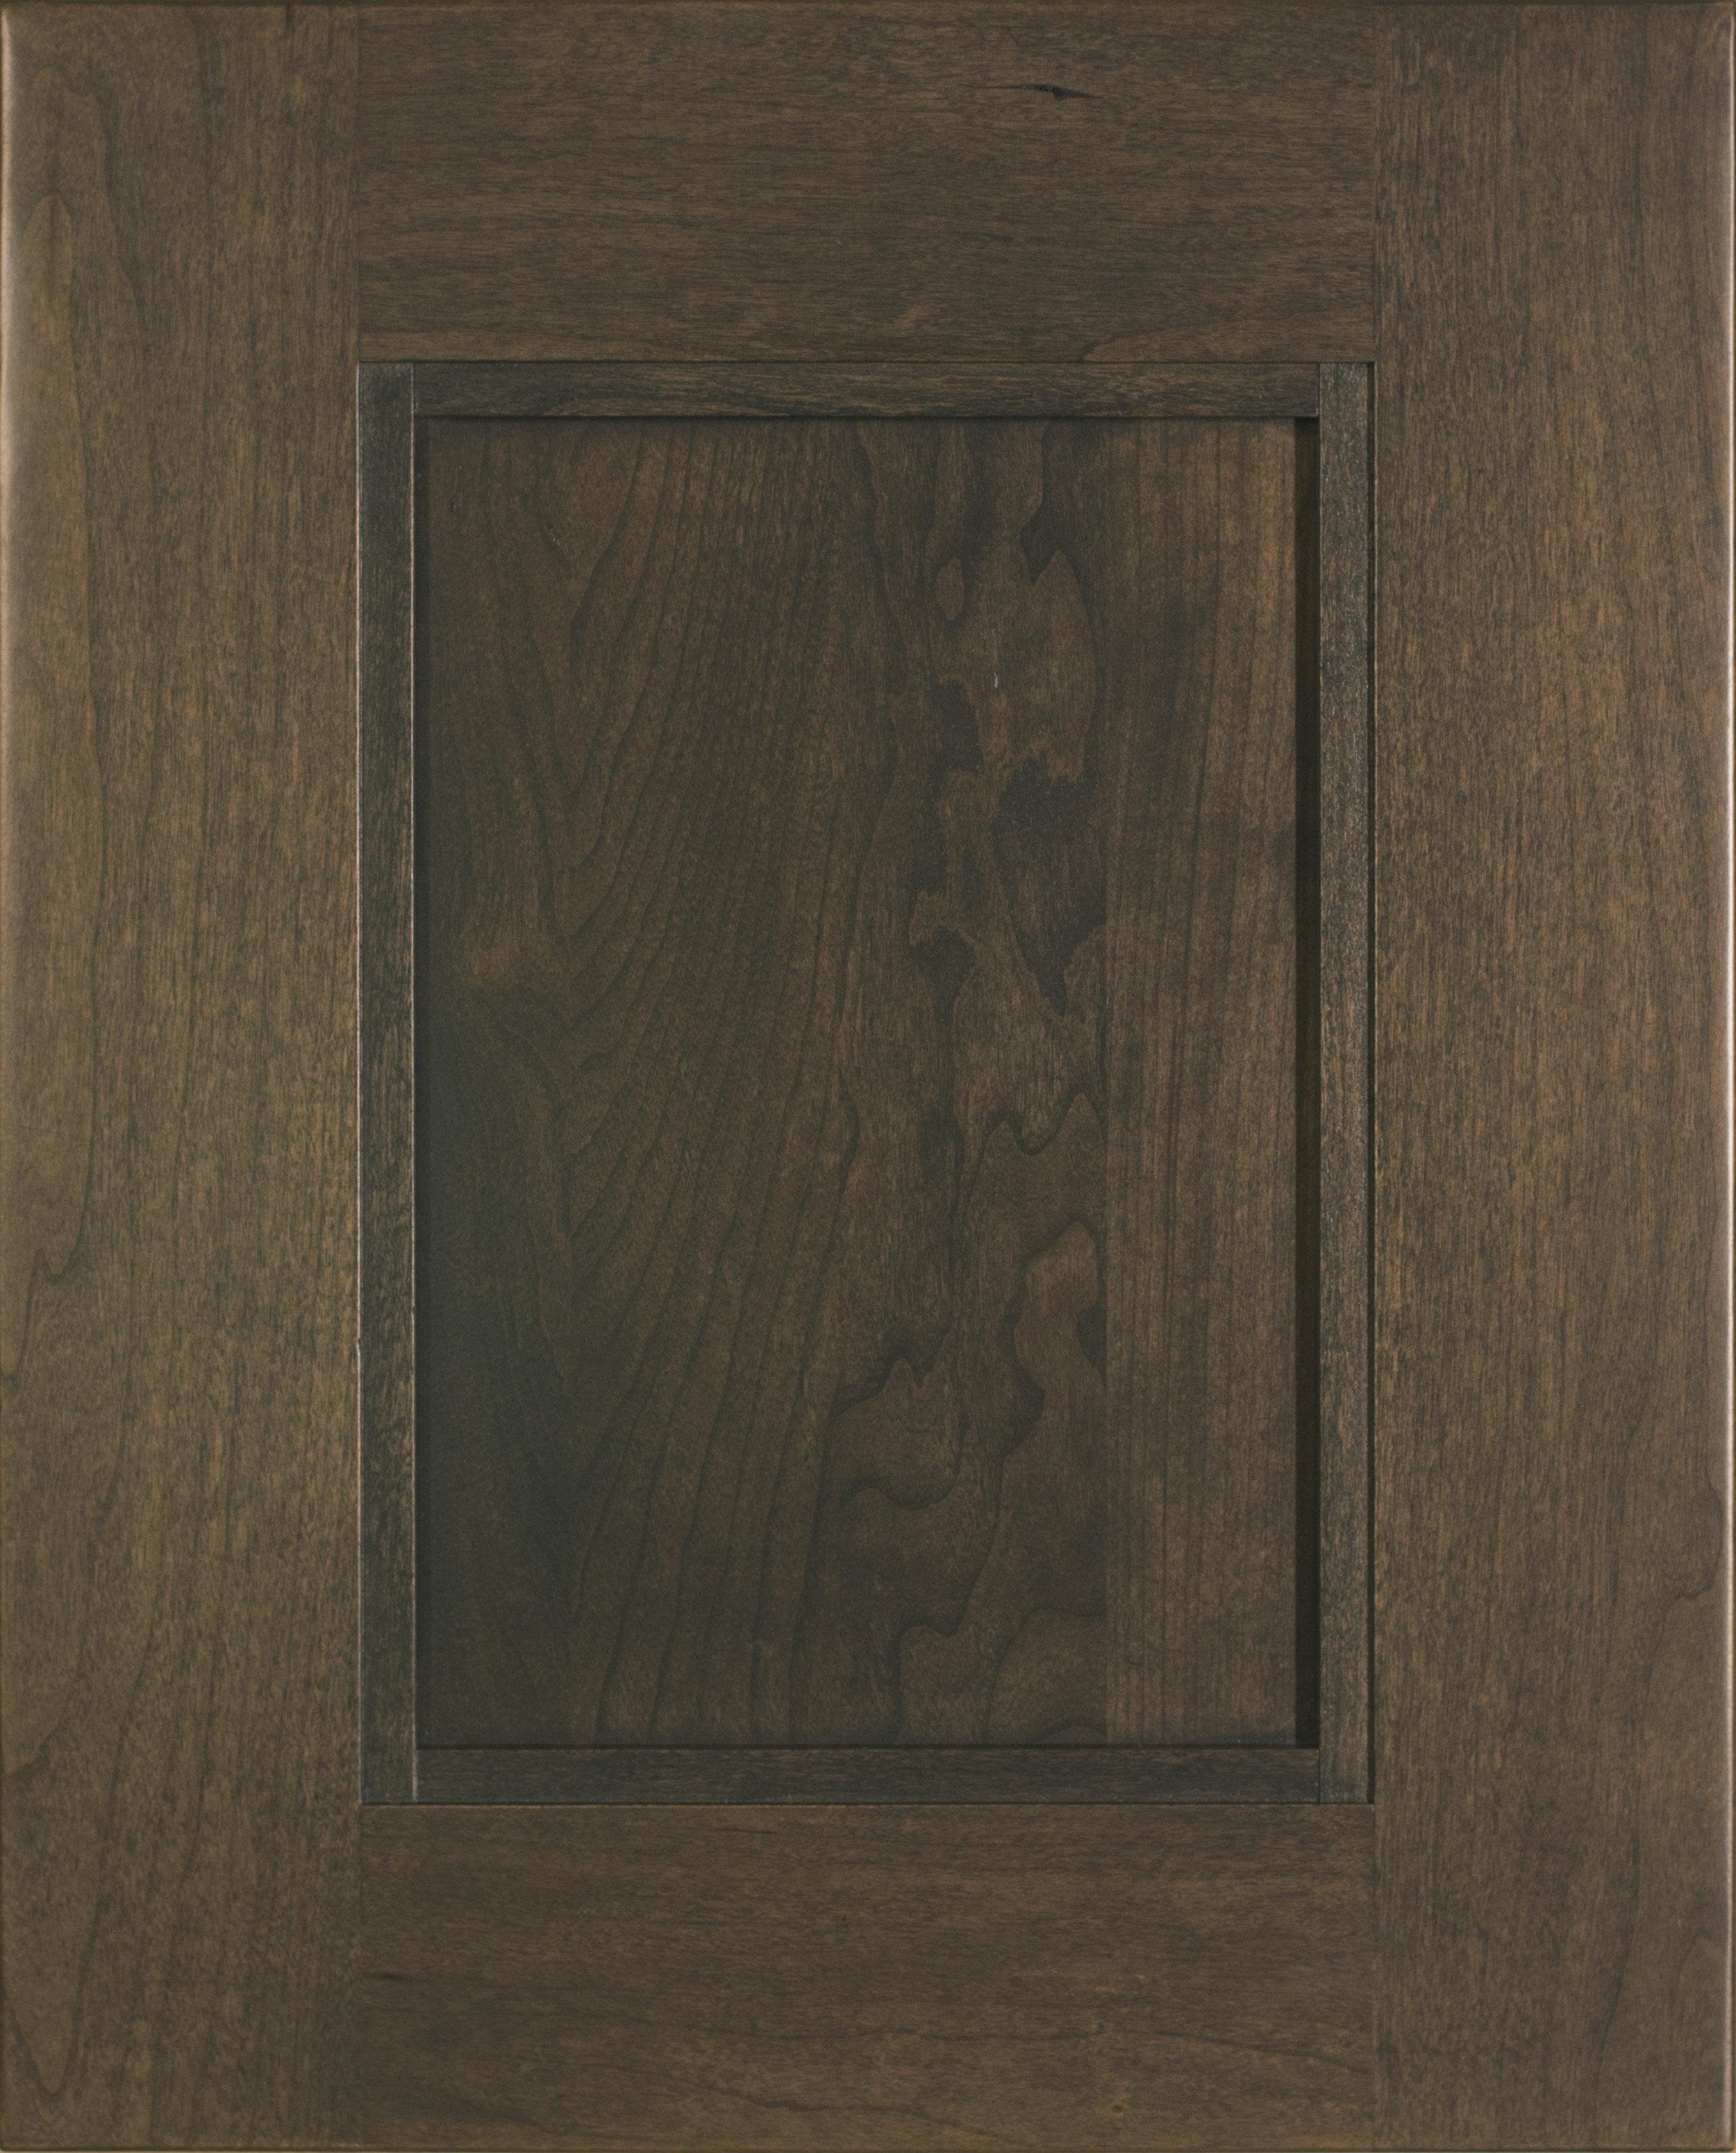 Acadia - Reverse Raised Center PanelCherry | Maple | Paint | Rustic Beech | White OakShown in Cherry Stone